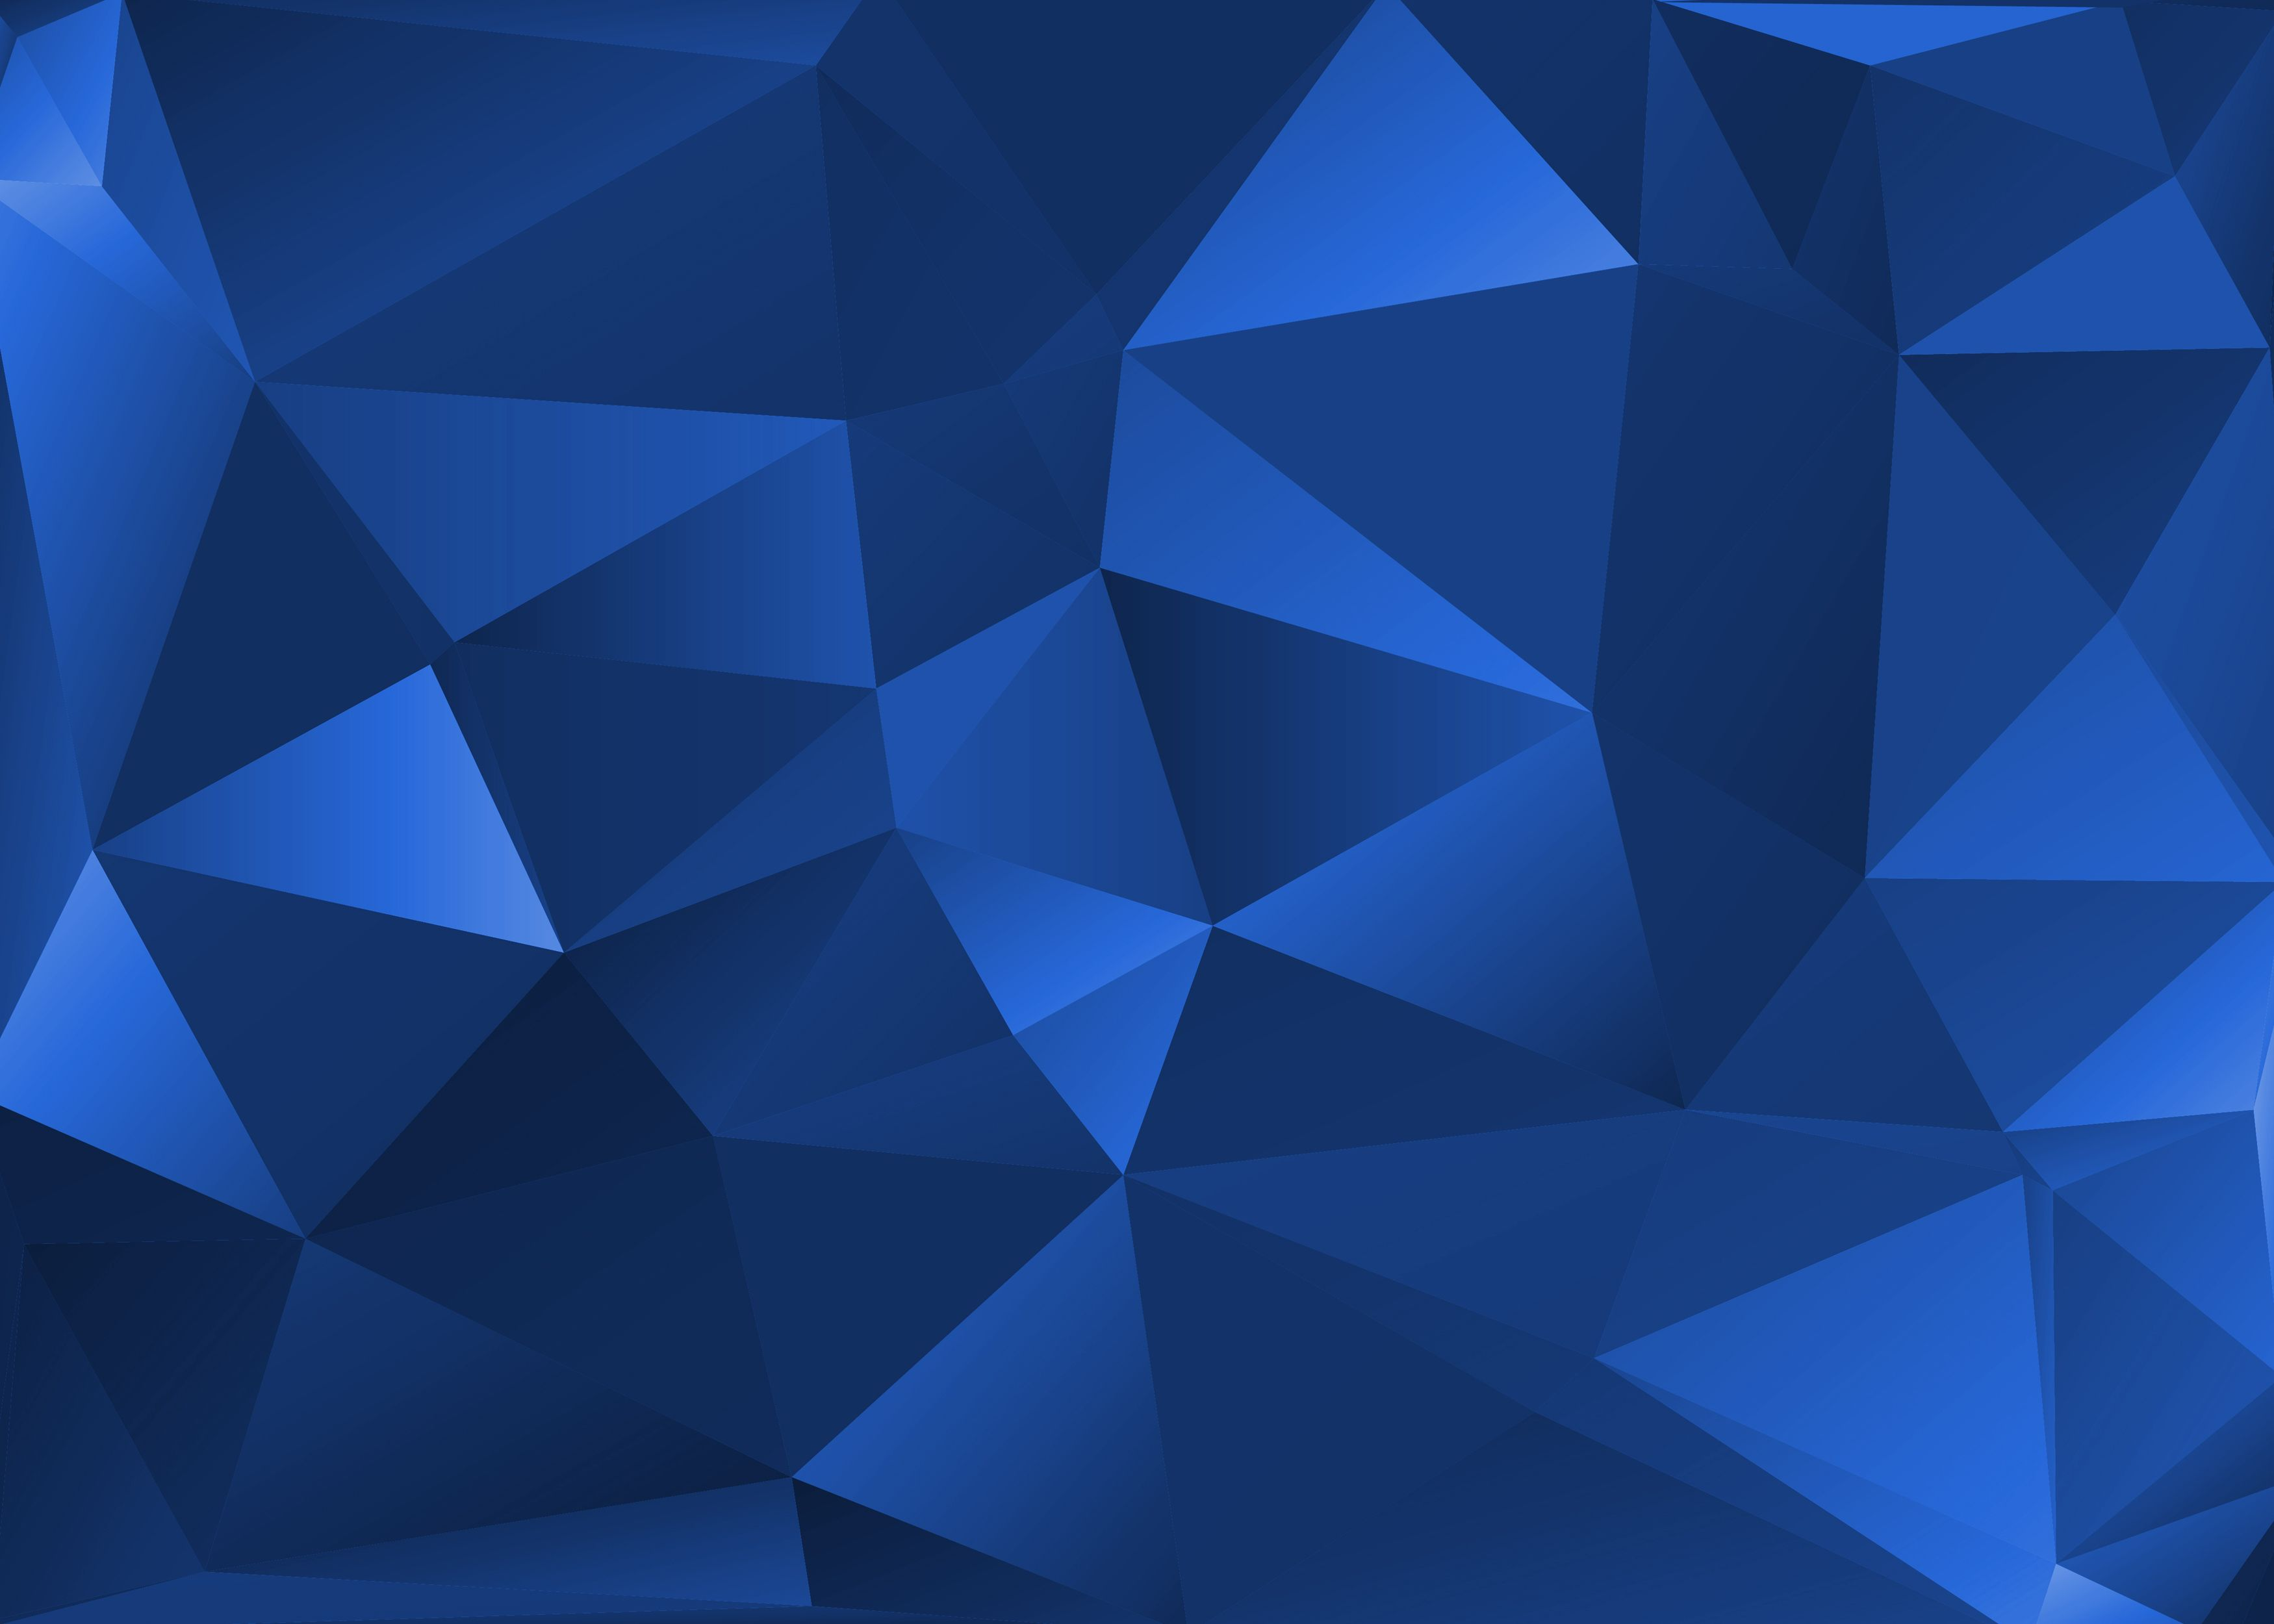 free polygon background - Cerca con Google | Background ...